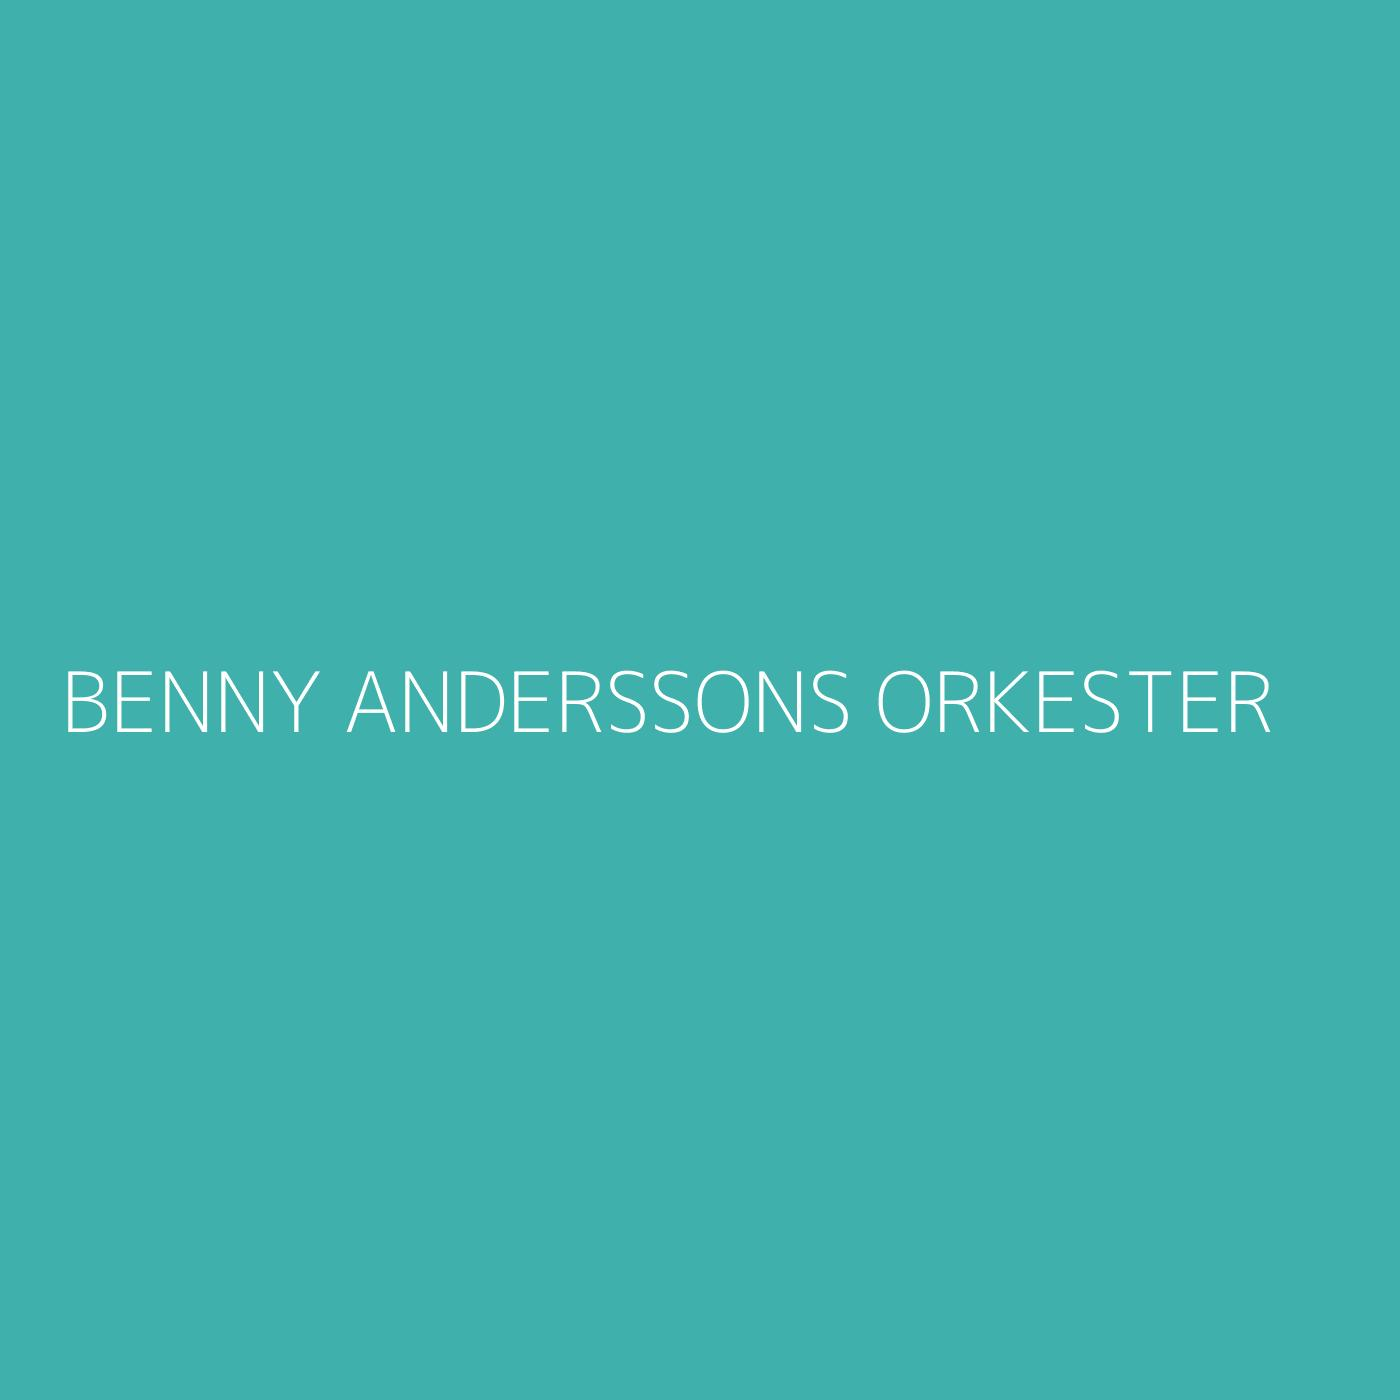 Benny Anderssons Orkester Playlist Artwork